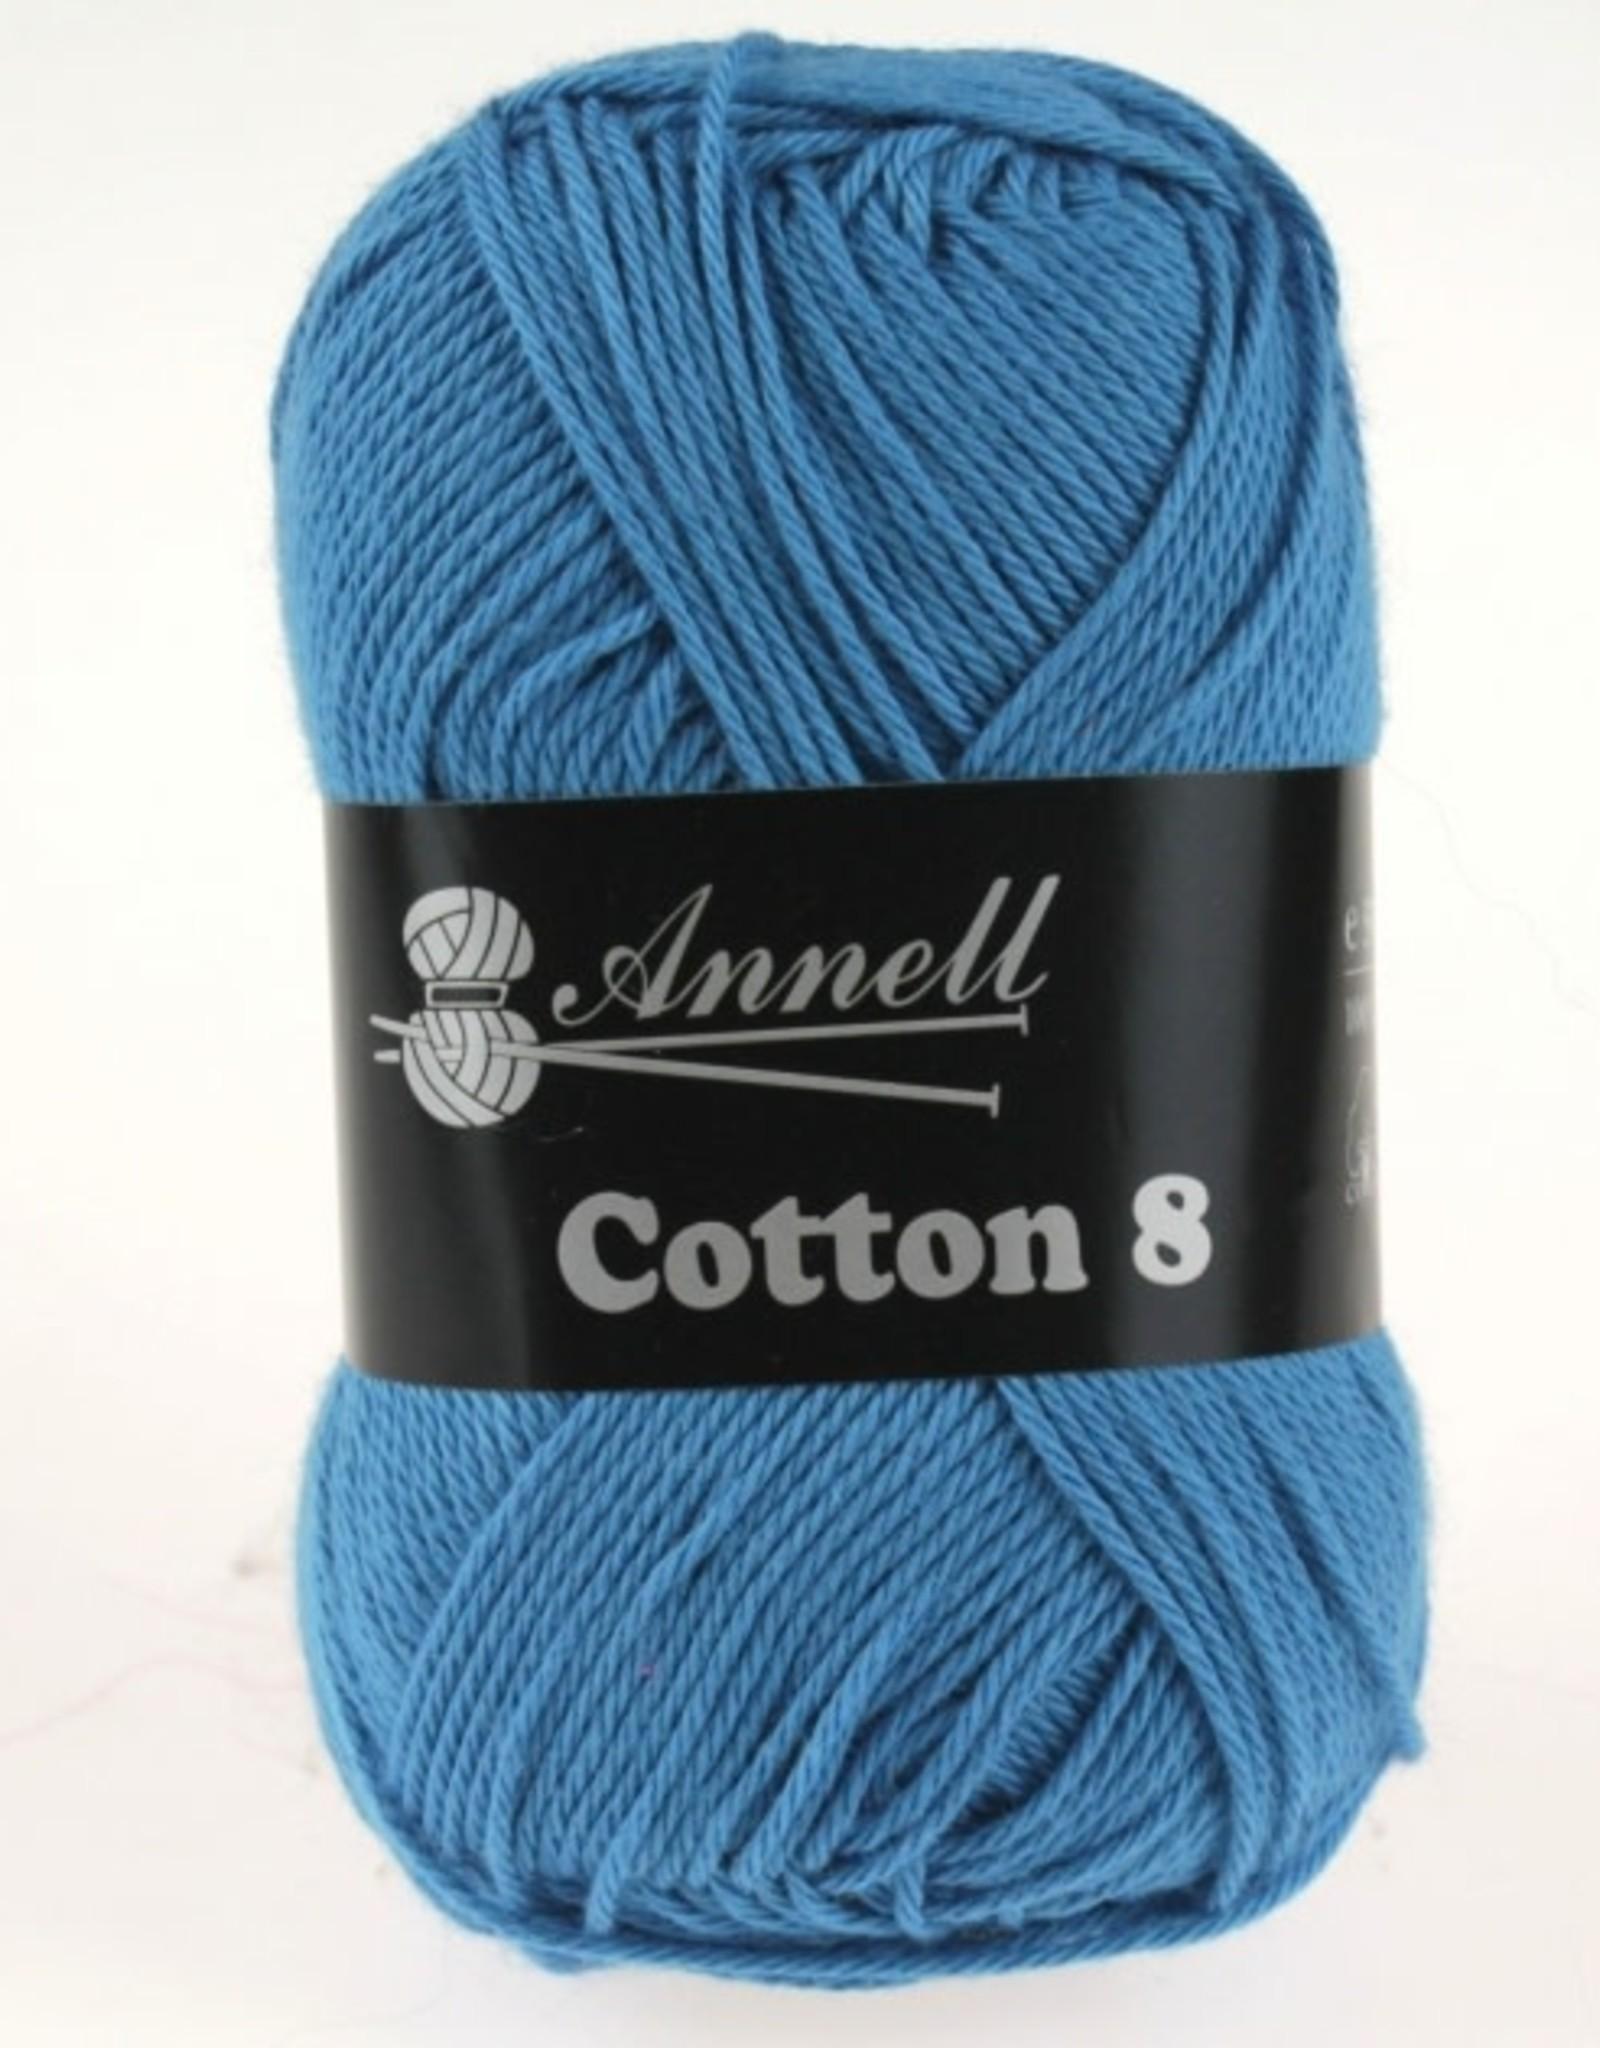 Annell Annell Cotton 8 39